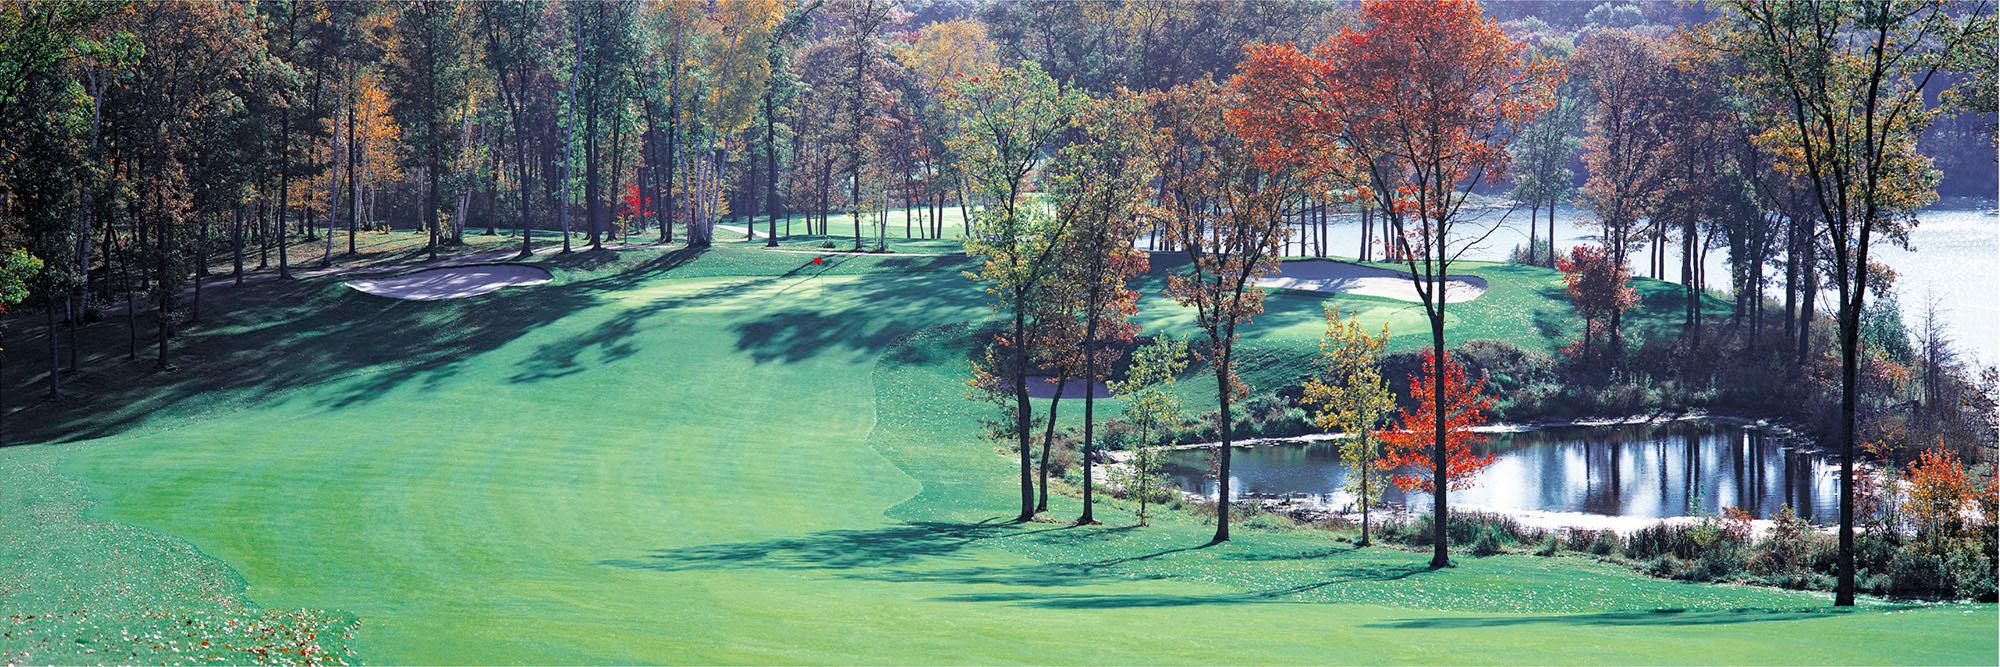 Golf Course Image - Maddens Classic No. 1